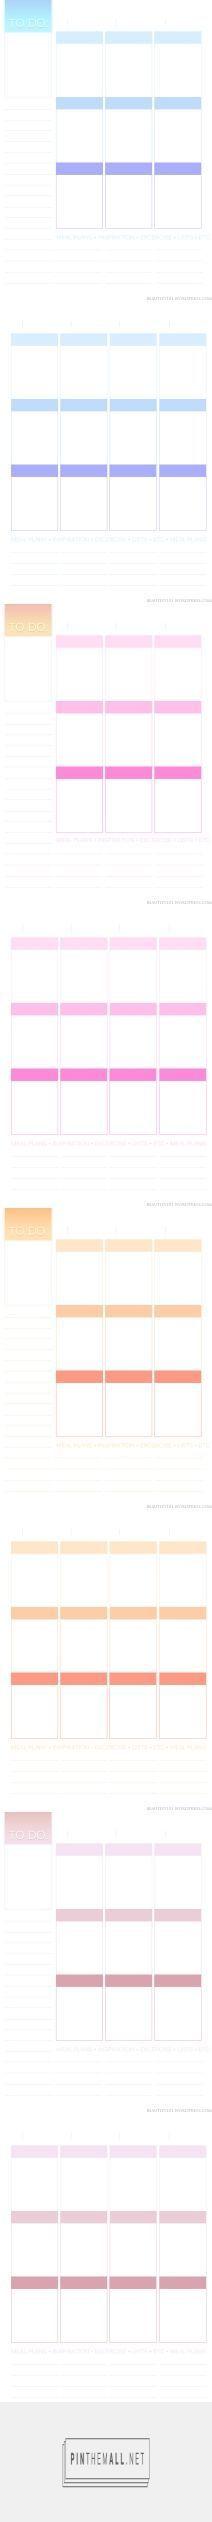 Planner Wish List Free printable, Planners and Free - printable loose leaf